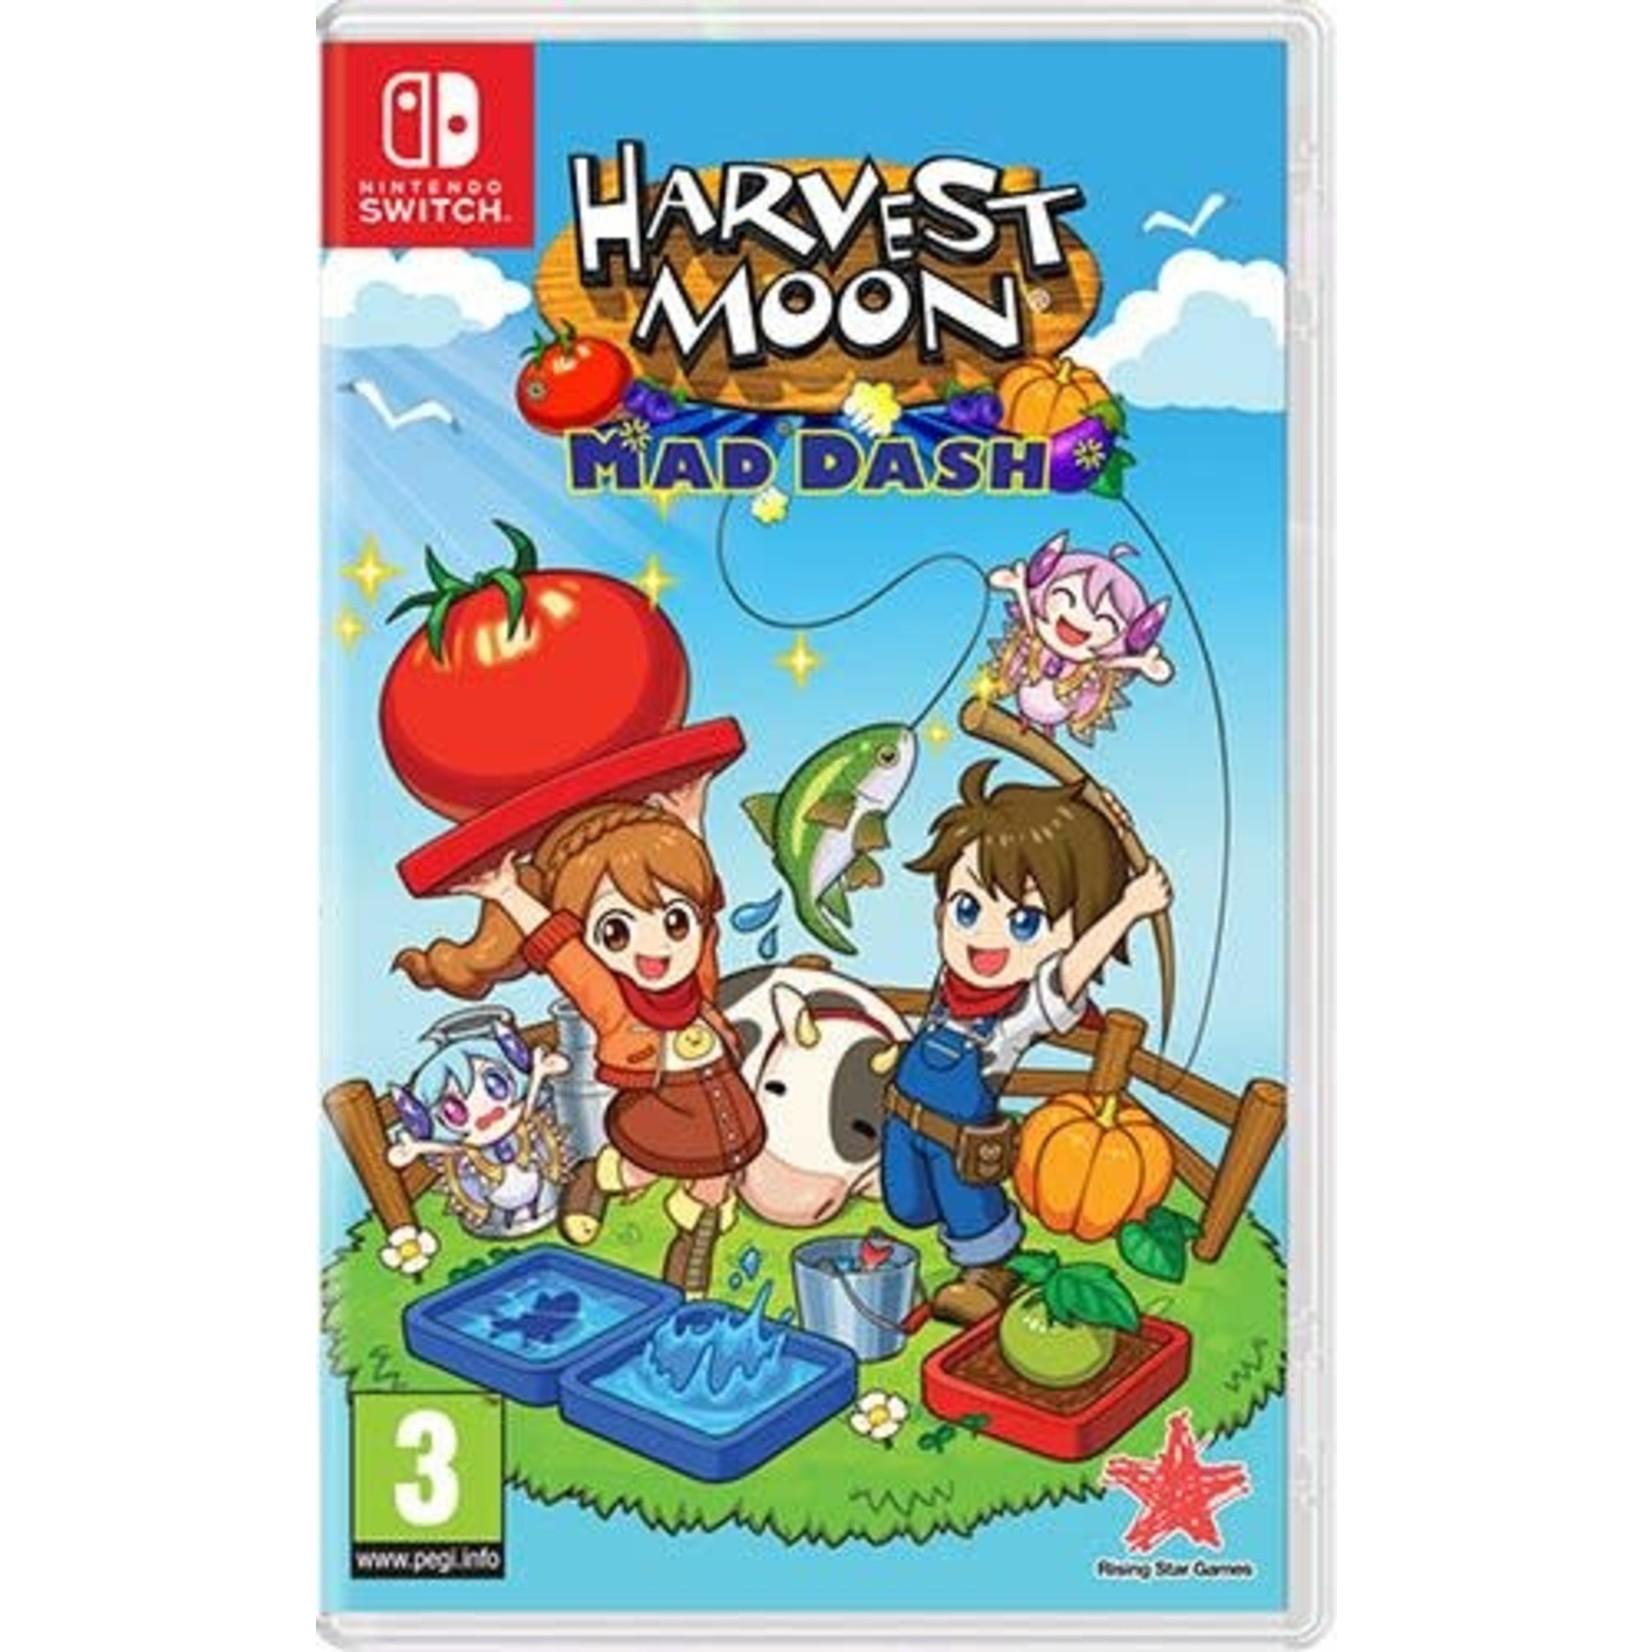 Switch-Harvest Moon: MAD DASH